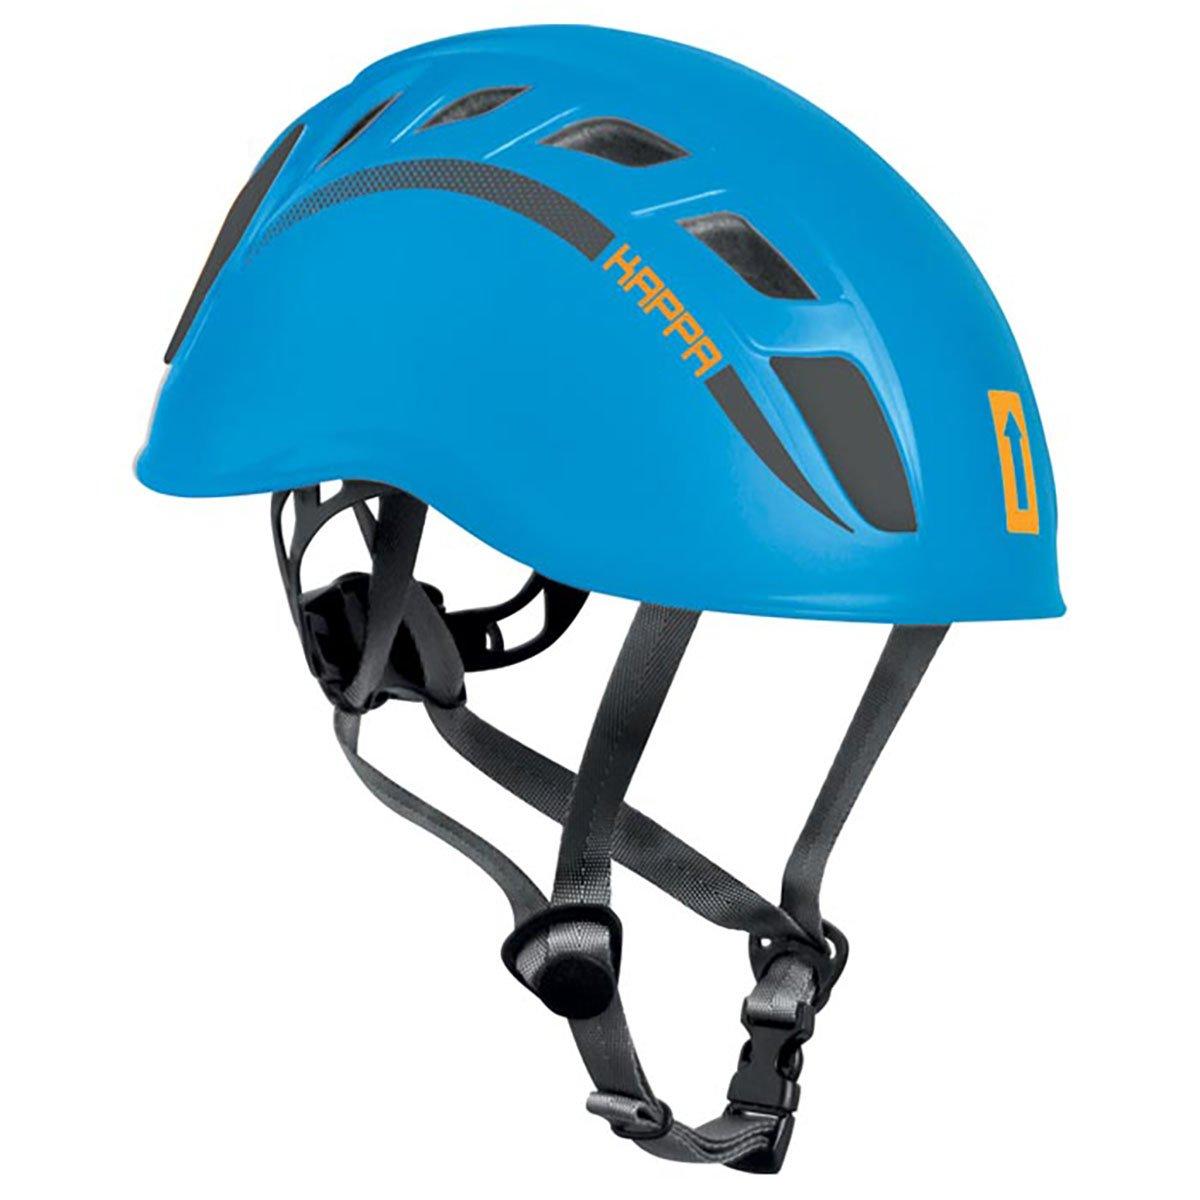 Singing Rock C0052-青 Kappa Climb Helmet - 青